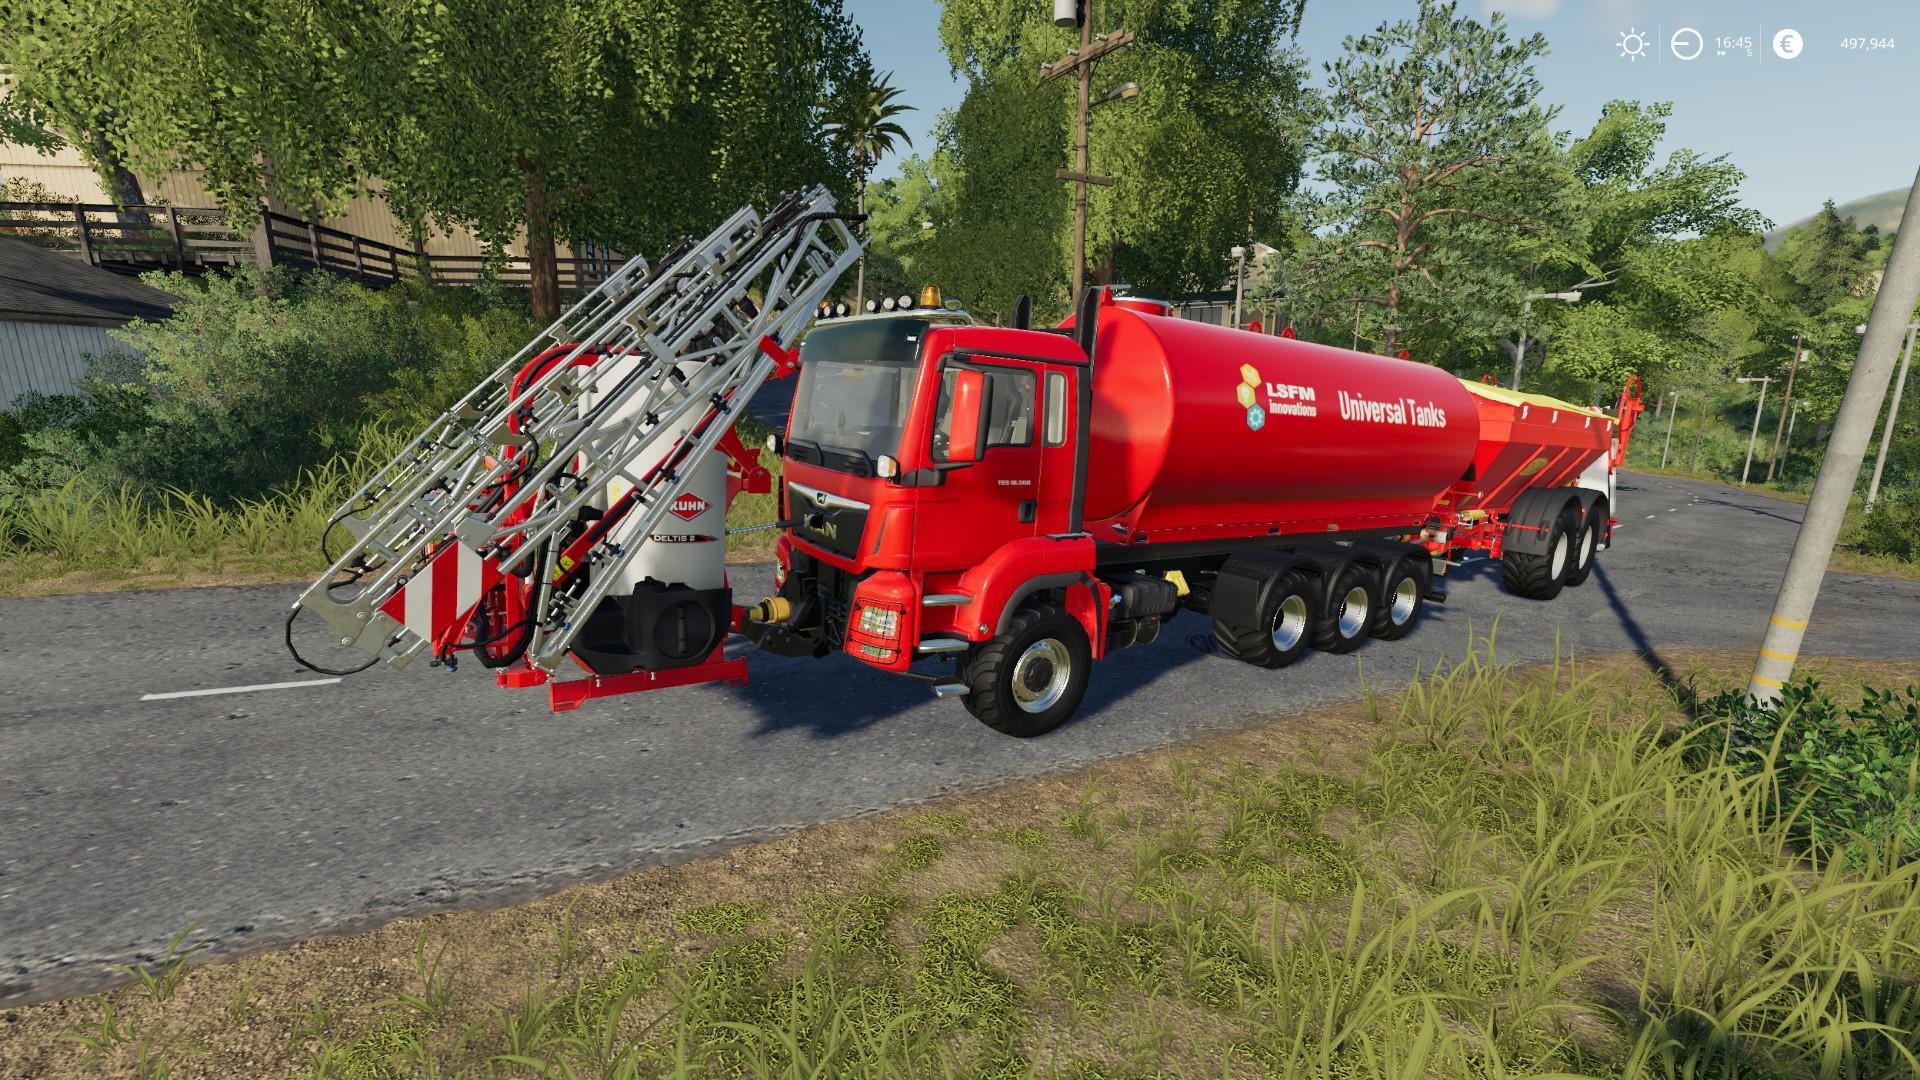 MAN TGS 18 500 HOOKLIFT - Farming Simulator 19 Mods - Ai Cave